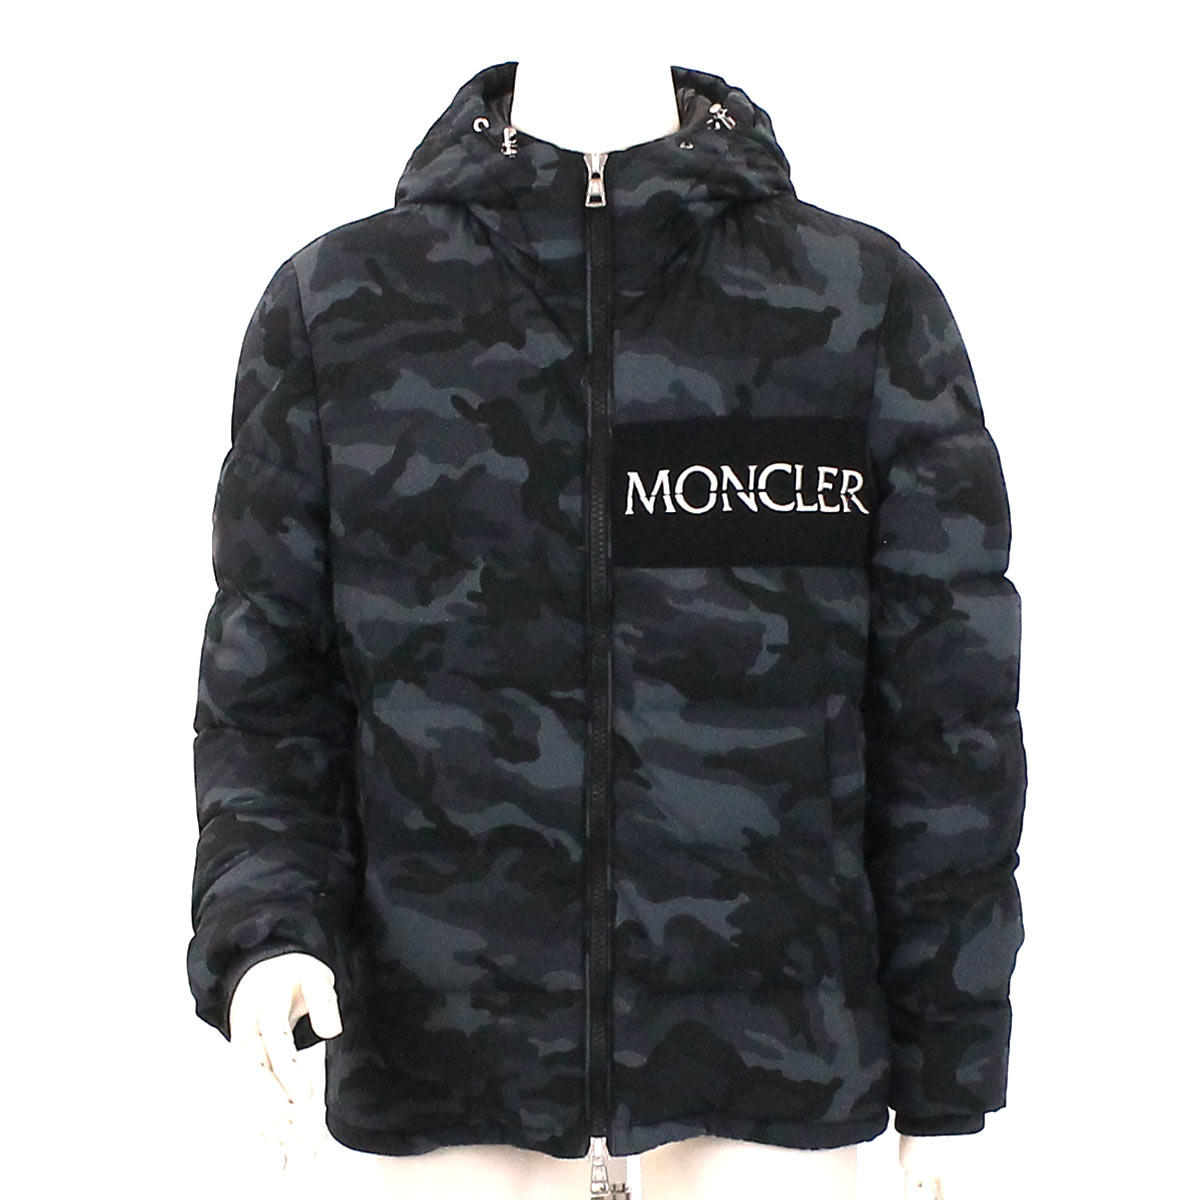 MONCLER Daunenjacke AITON Baumwolle Camouflage Navy 3 2018 Männer 90078929 | eBay